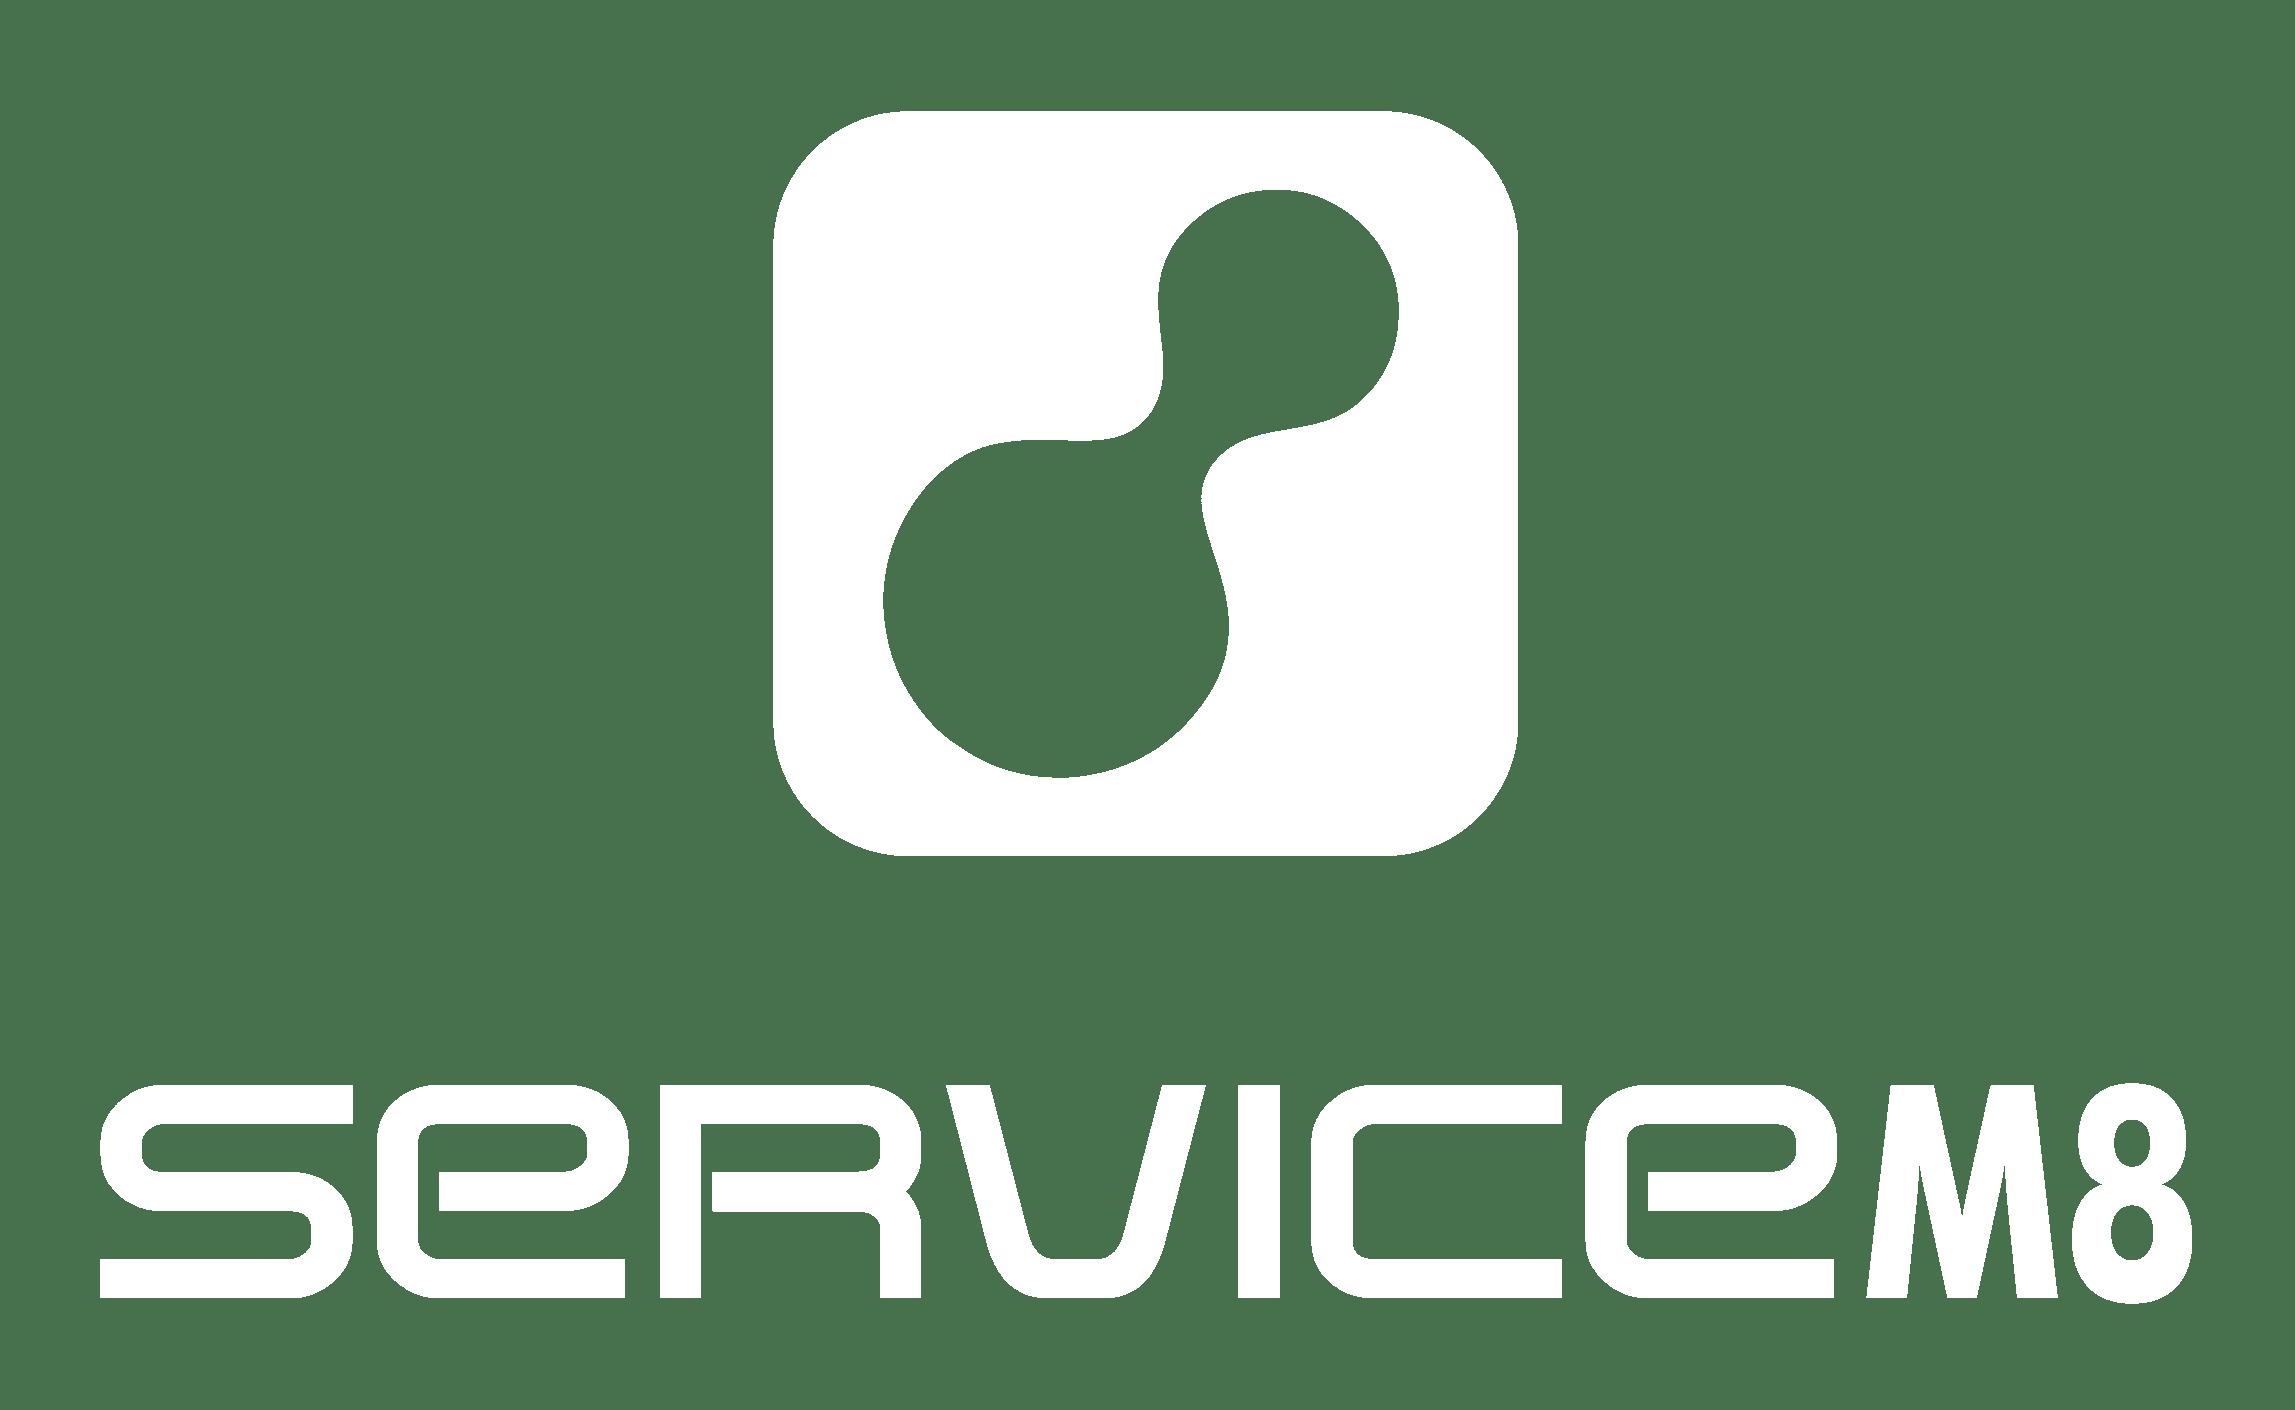 https://cdn.linkadvisors.com.au/wp-content/uploads/media/2020/12/ServiceM8_Logo_Vertical.png